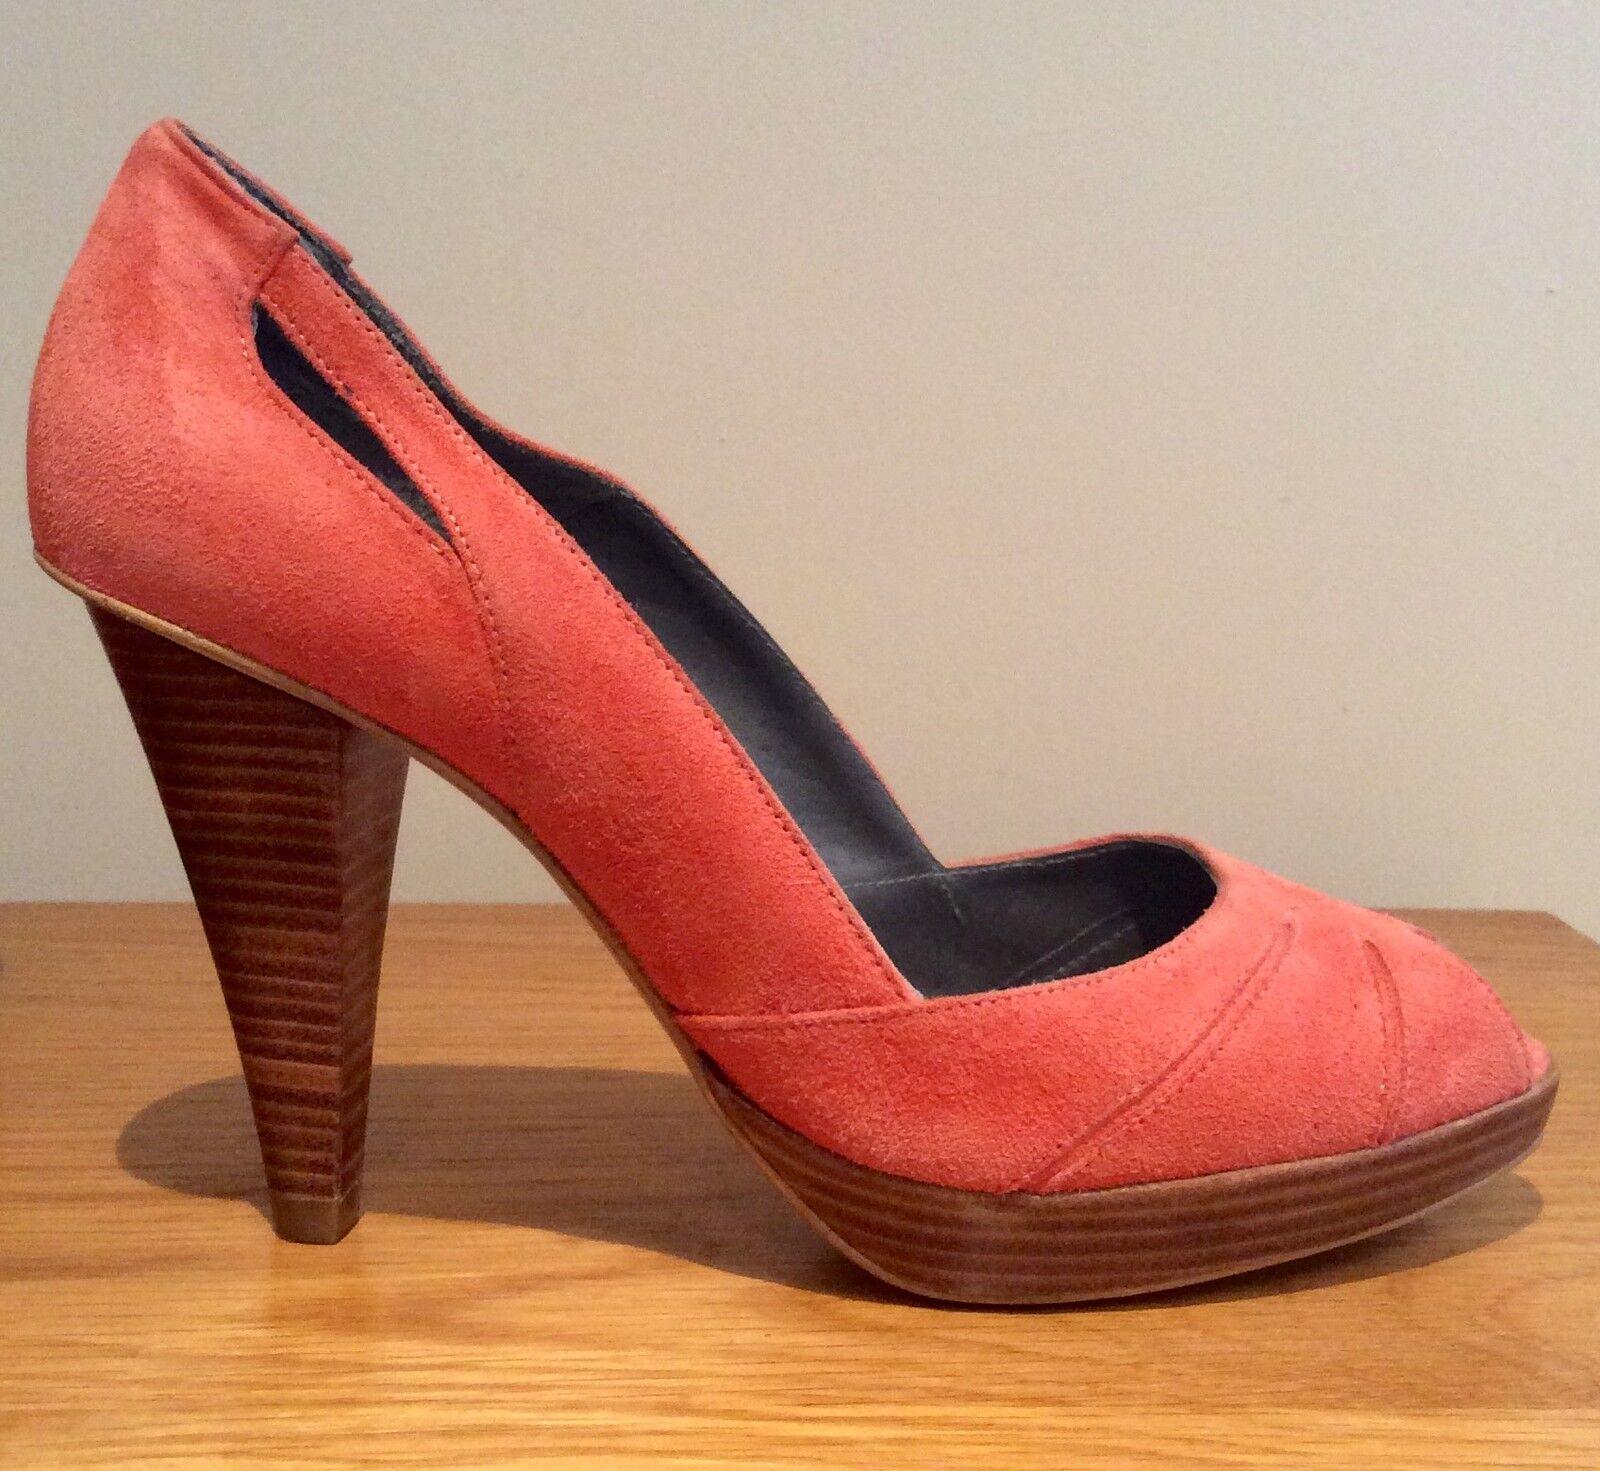 Jigsaw Chaussures   Taille 38 UK 5 Corail Daim Cuir Découpe Talons Hauts Plateforme